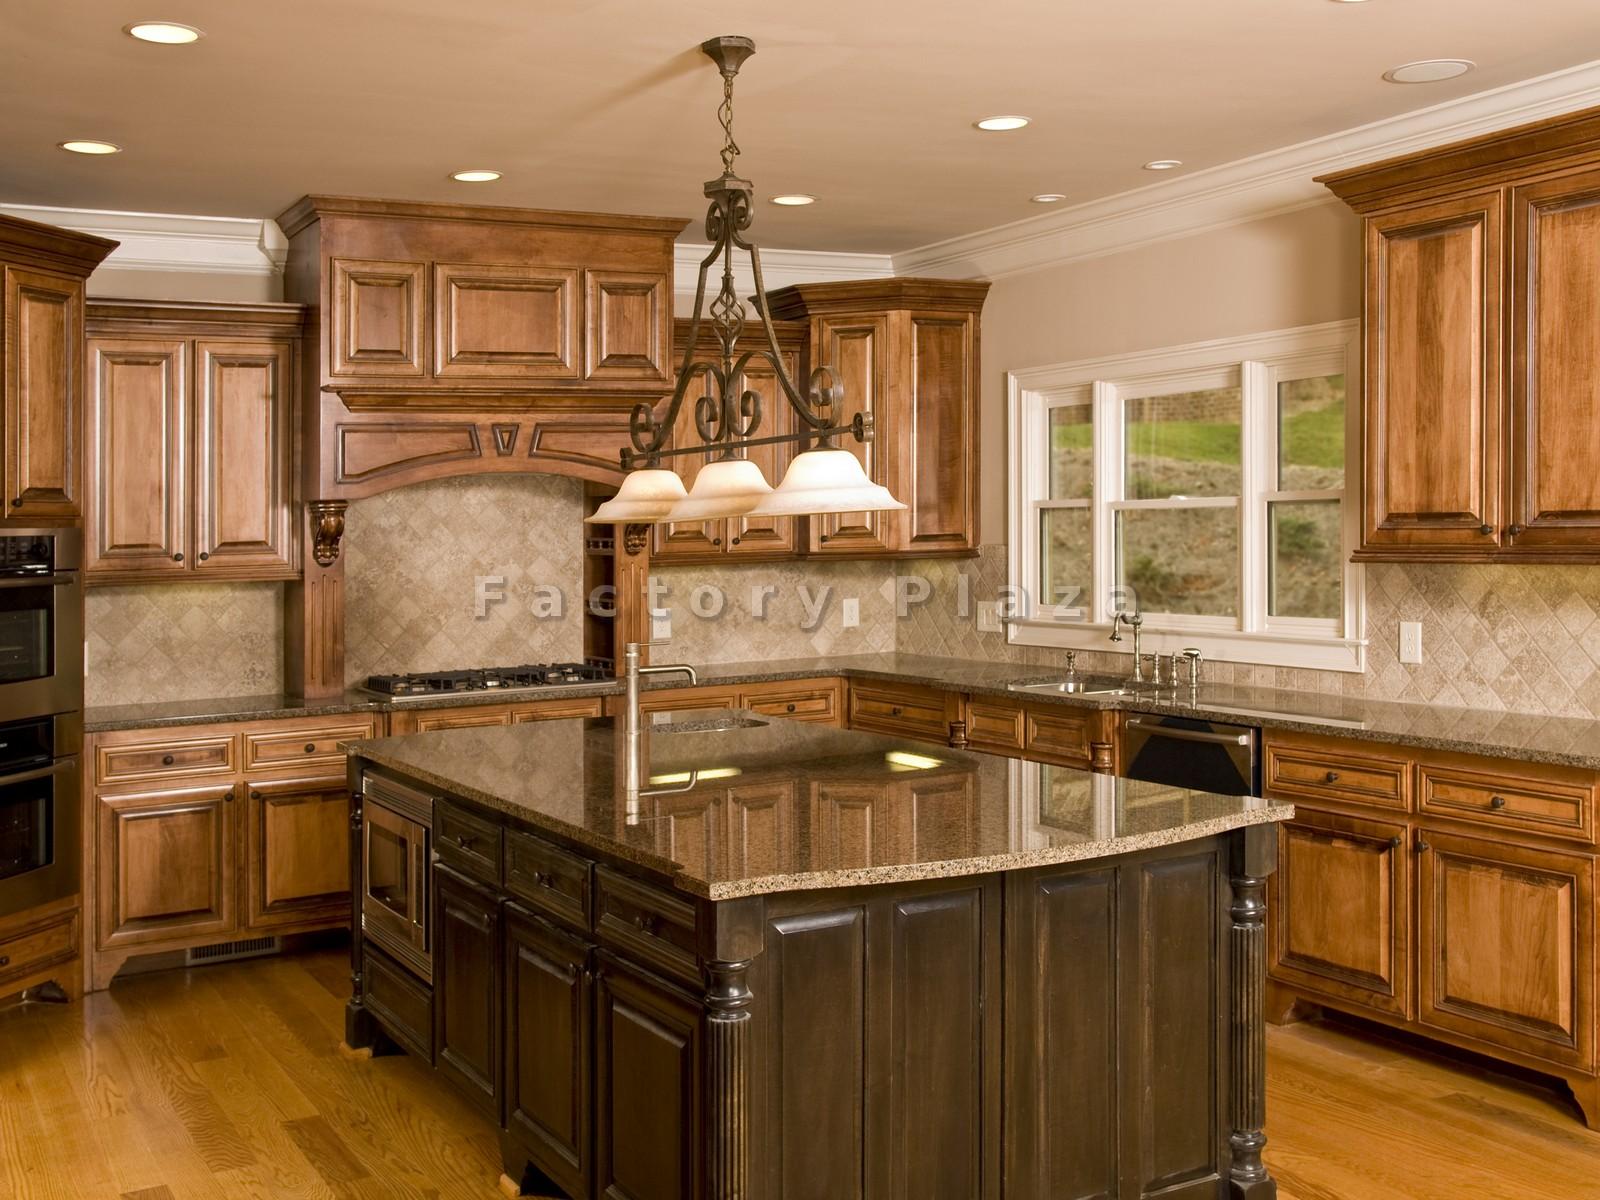 Yorktown Cabinets | Menards Custom Cabinets | Merlot Kitchen Cabinets